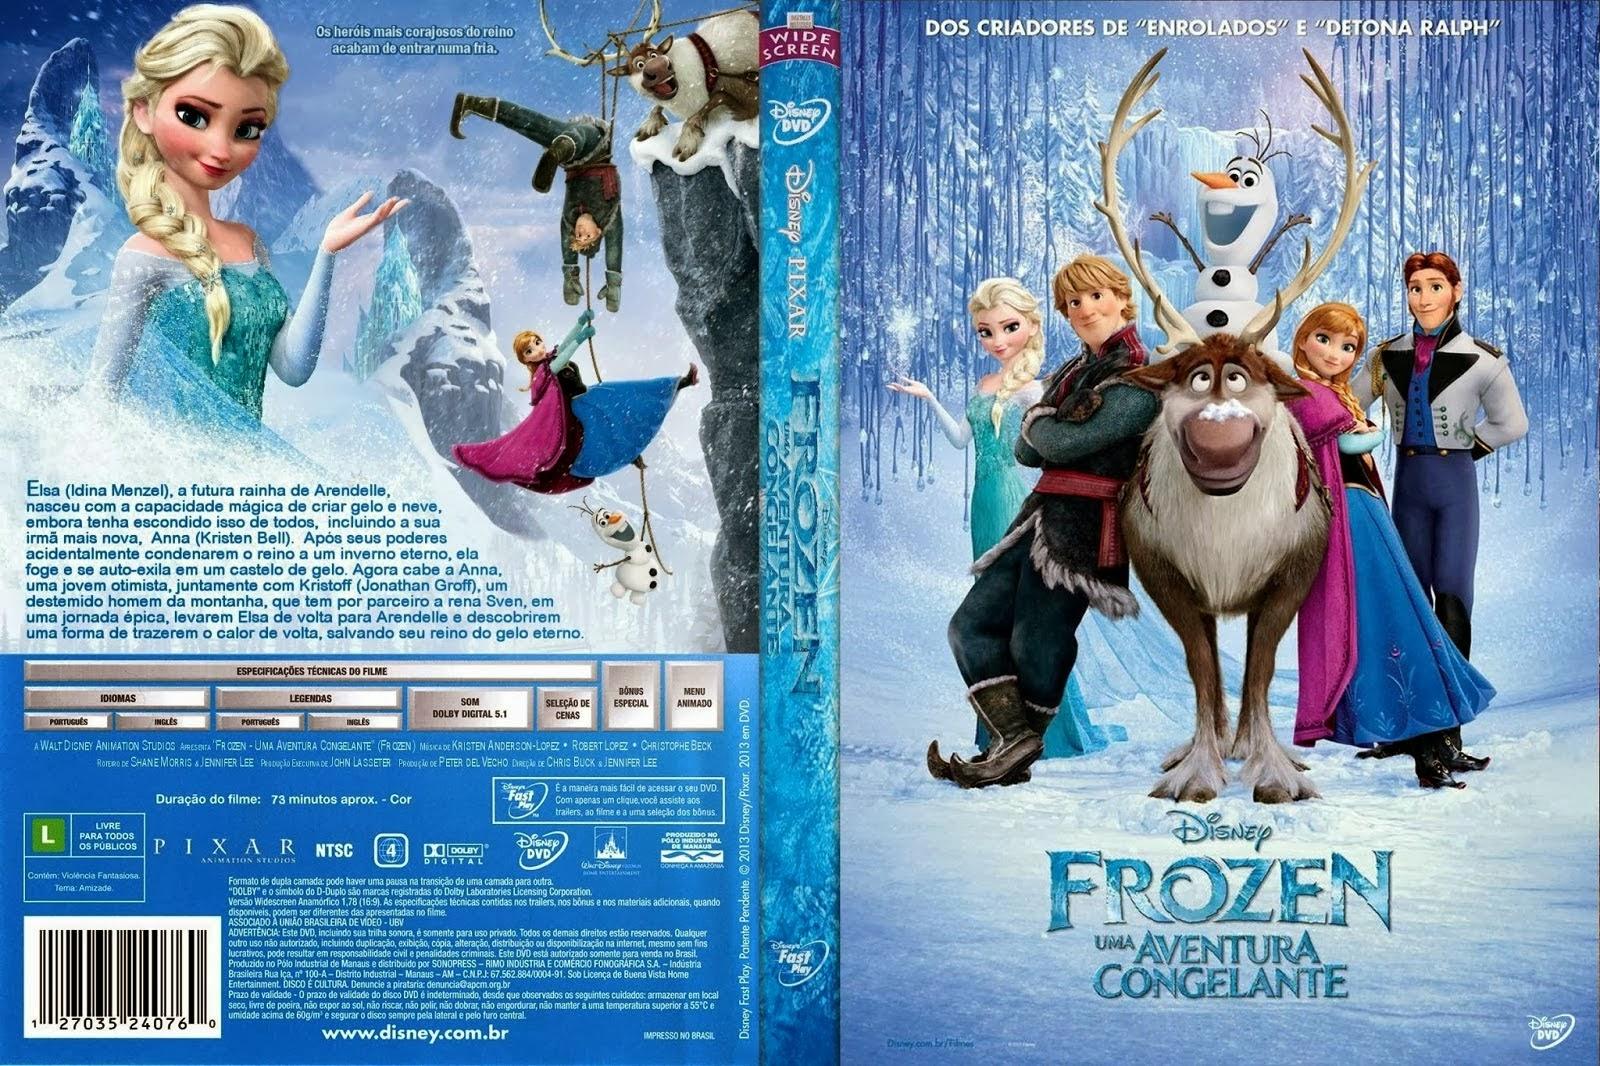 Imagens Frozen Uma Aventura Congelante Great mulheres em círculo®: filme - frozen, uma aventura congelante